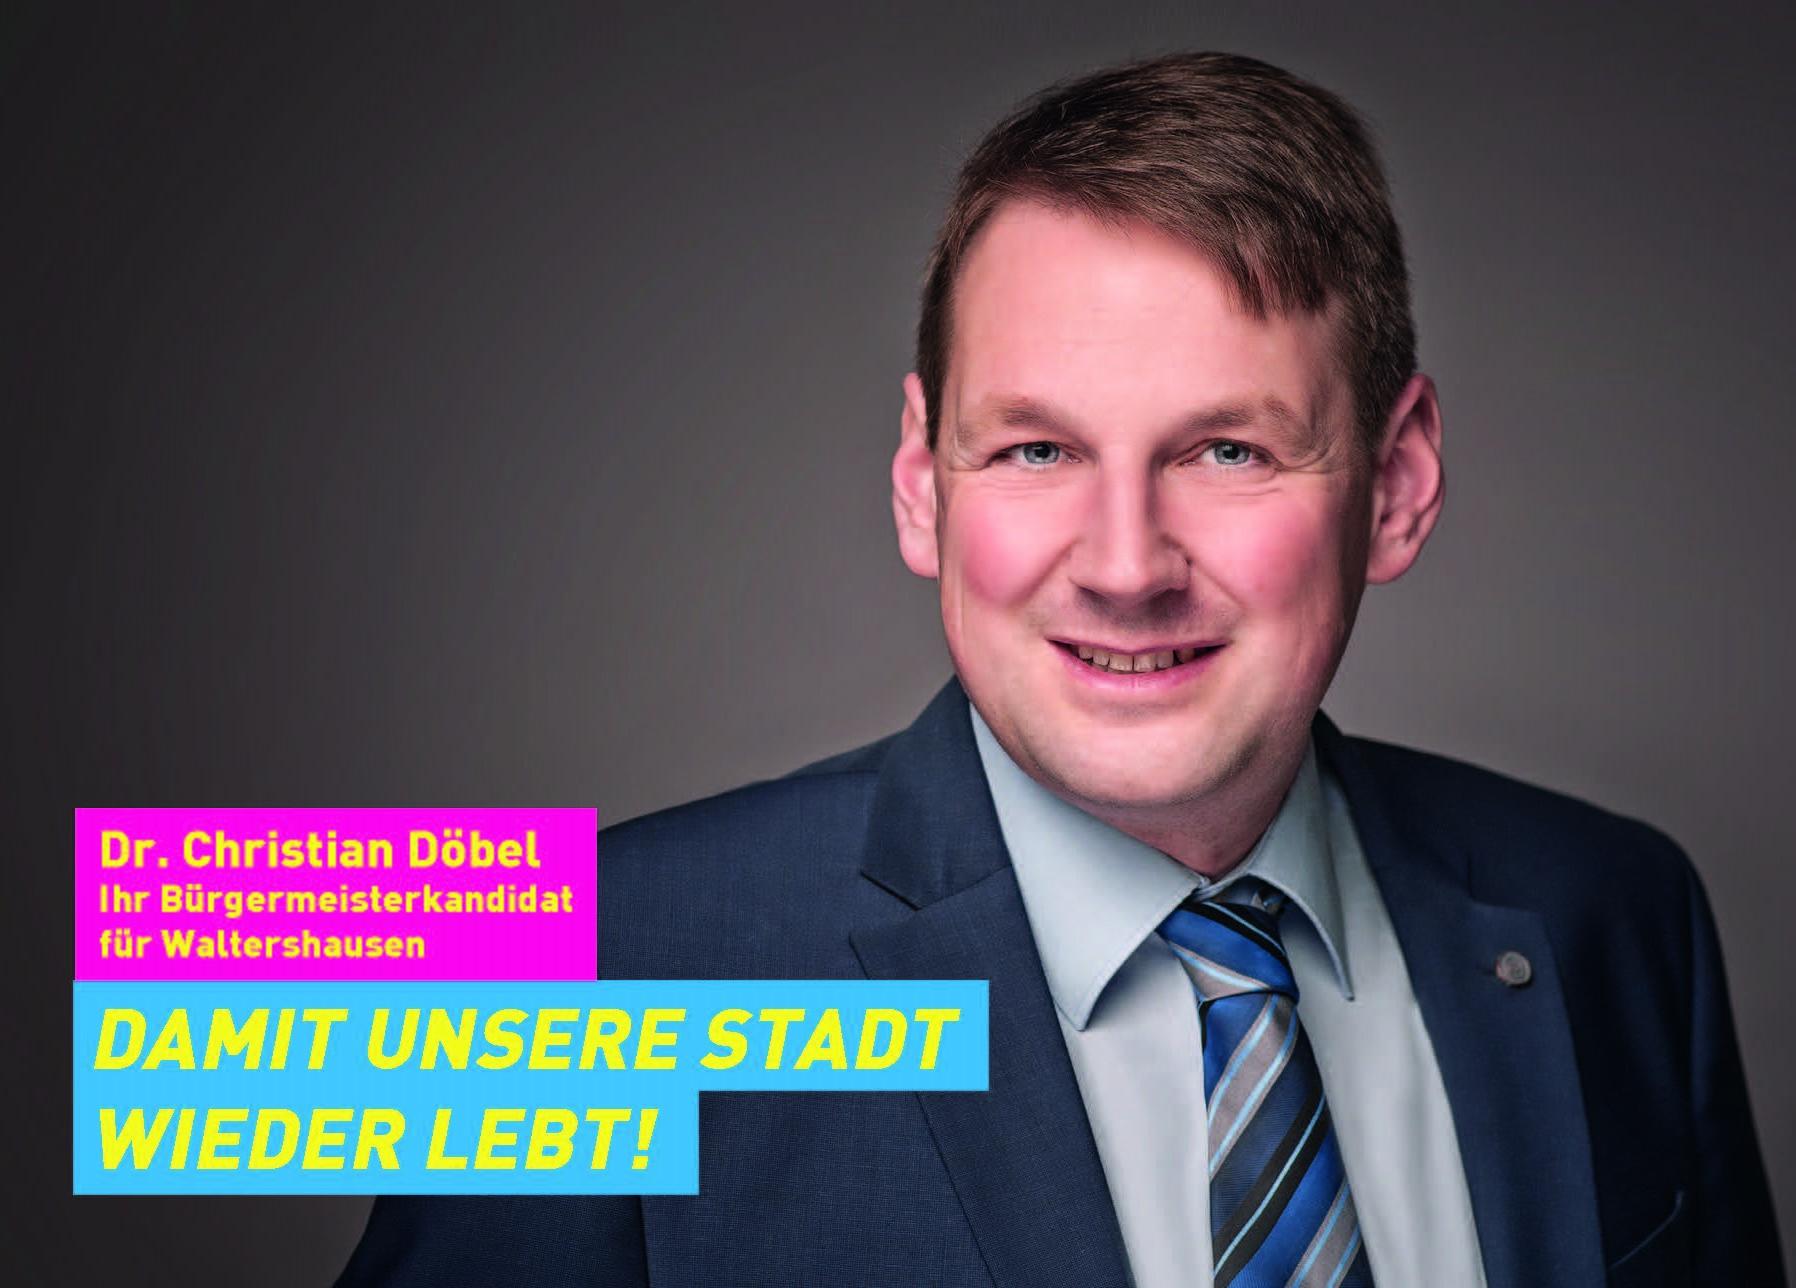 Unser Bürgermeisterkandidat Christian Döbel